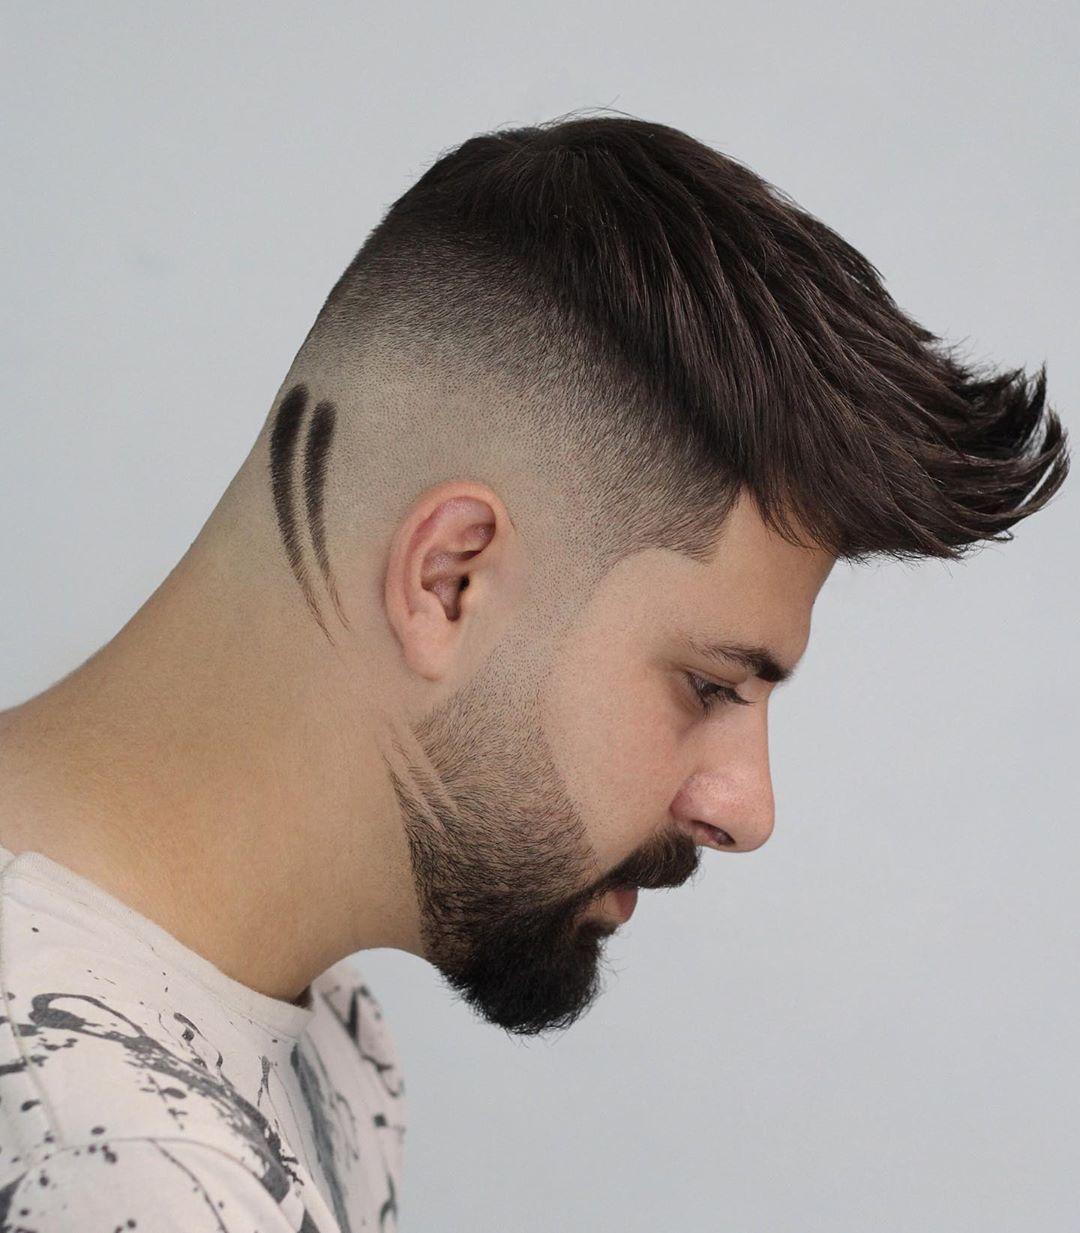 5 743 Vind Ik Leuks 221 Opmerkingen Mohammad Hamze Moohammad Hamze Op Instagram High Fade Linear Design Kapsel Man Stijle Kapsels Baard Stijl